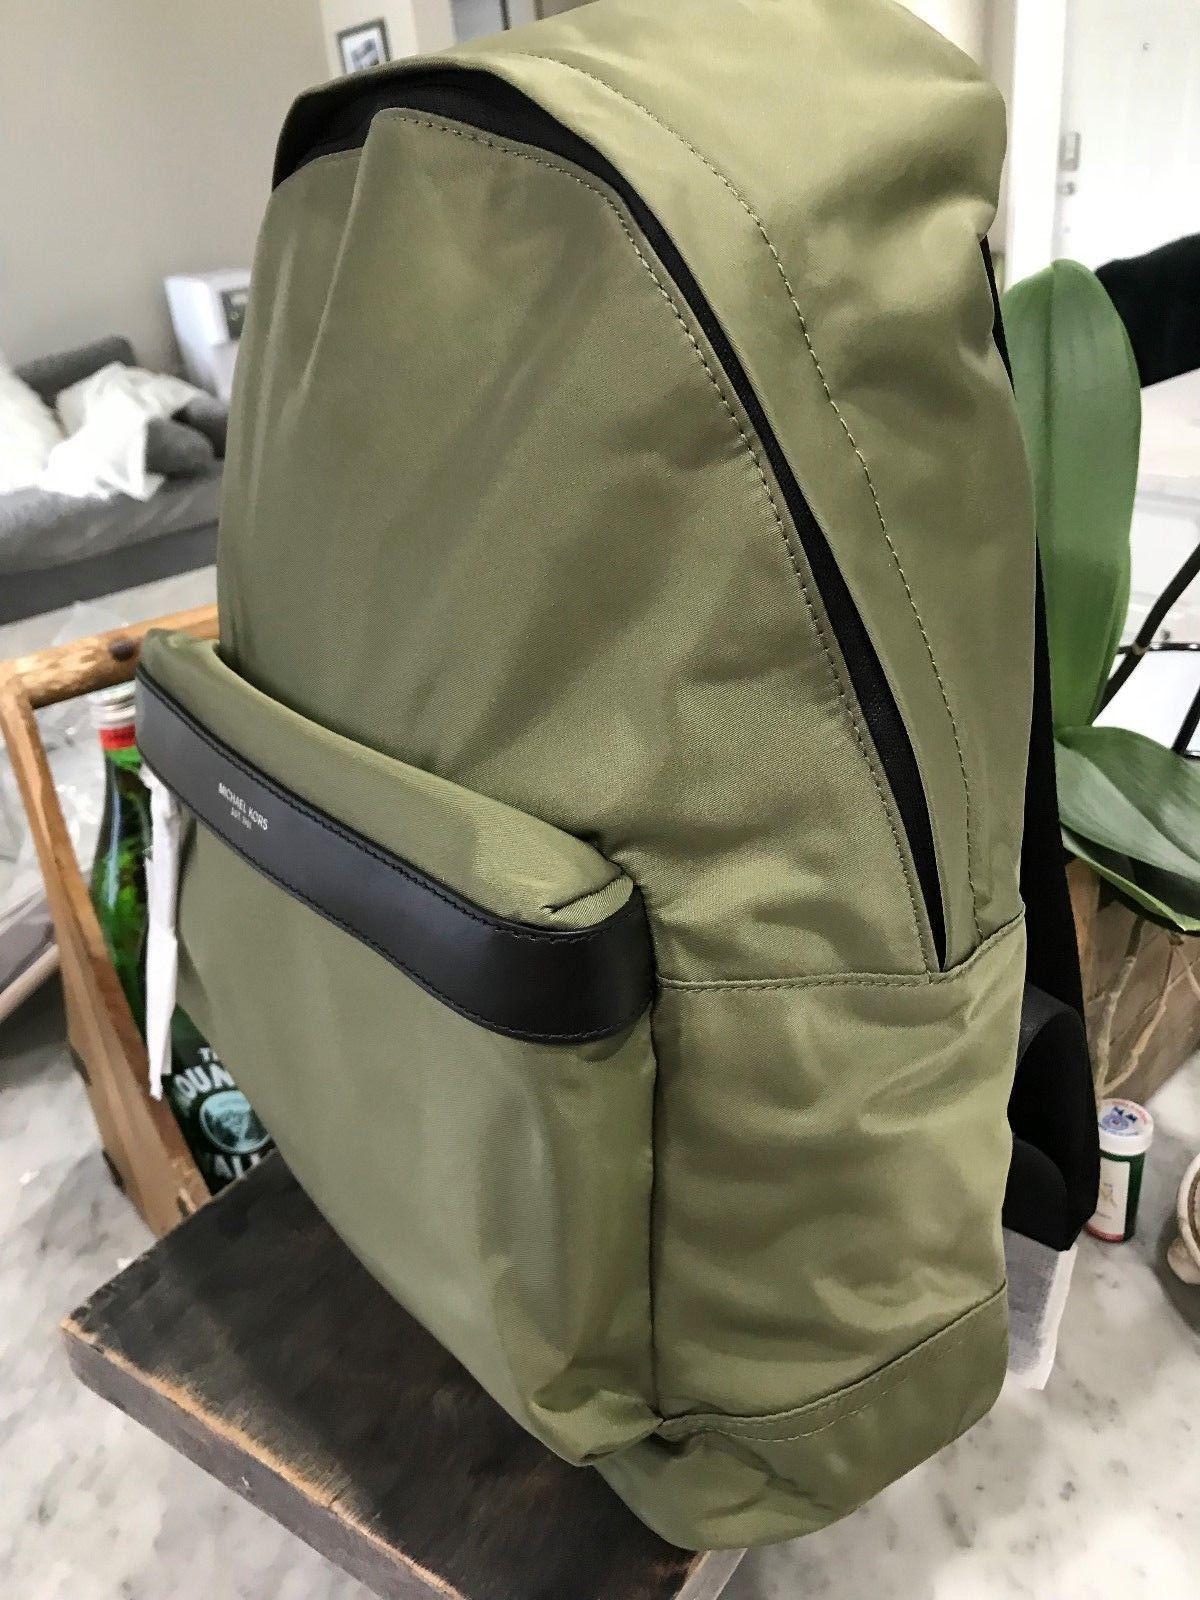 d4bdffabff Michael Kors Hombre Kent Nylon Tech Mochila en Hiedra (Verde Militar) Nuevo